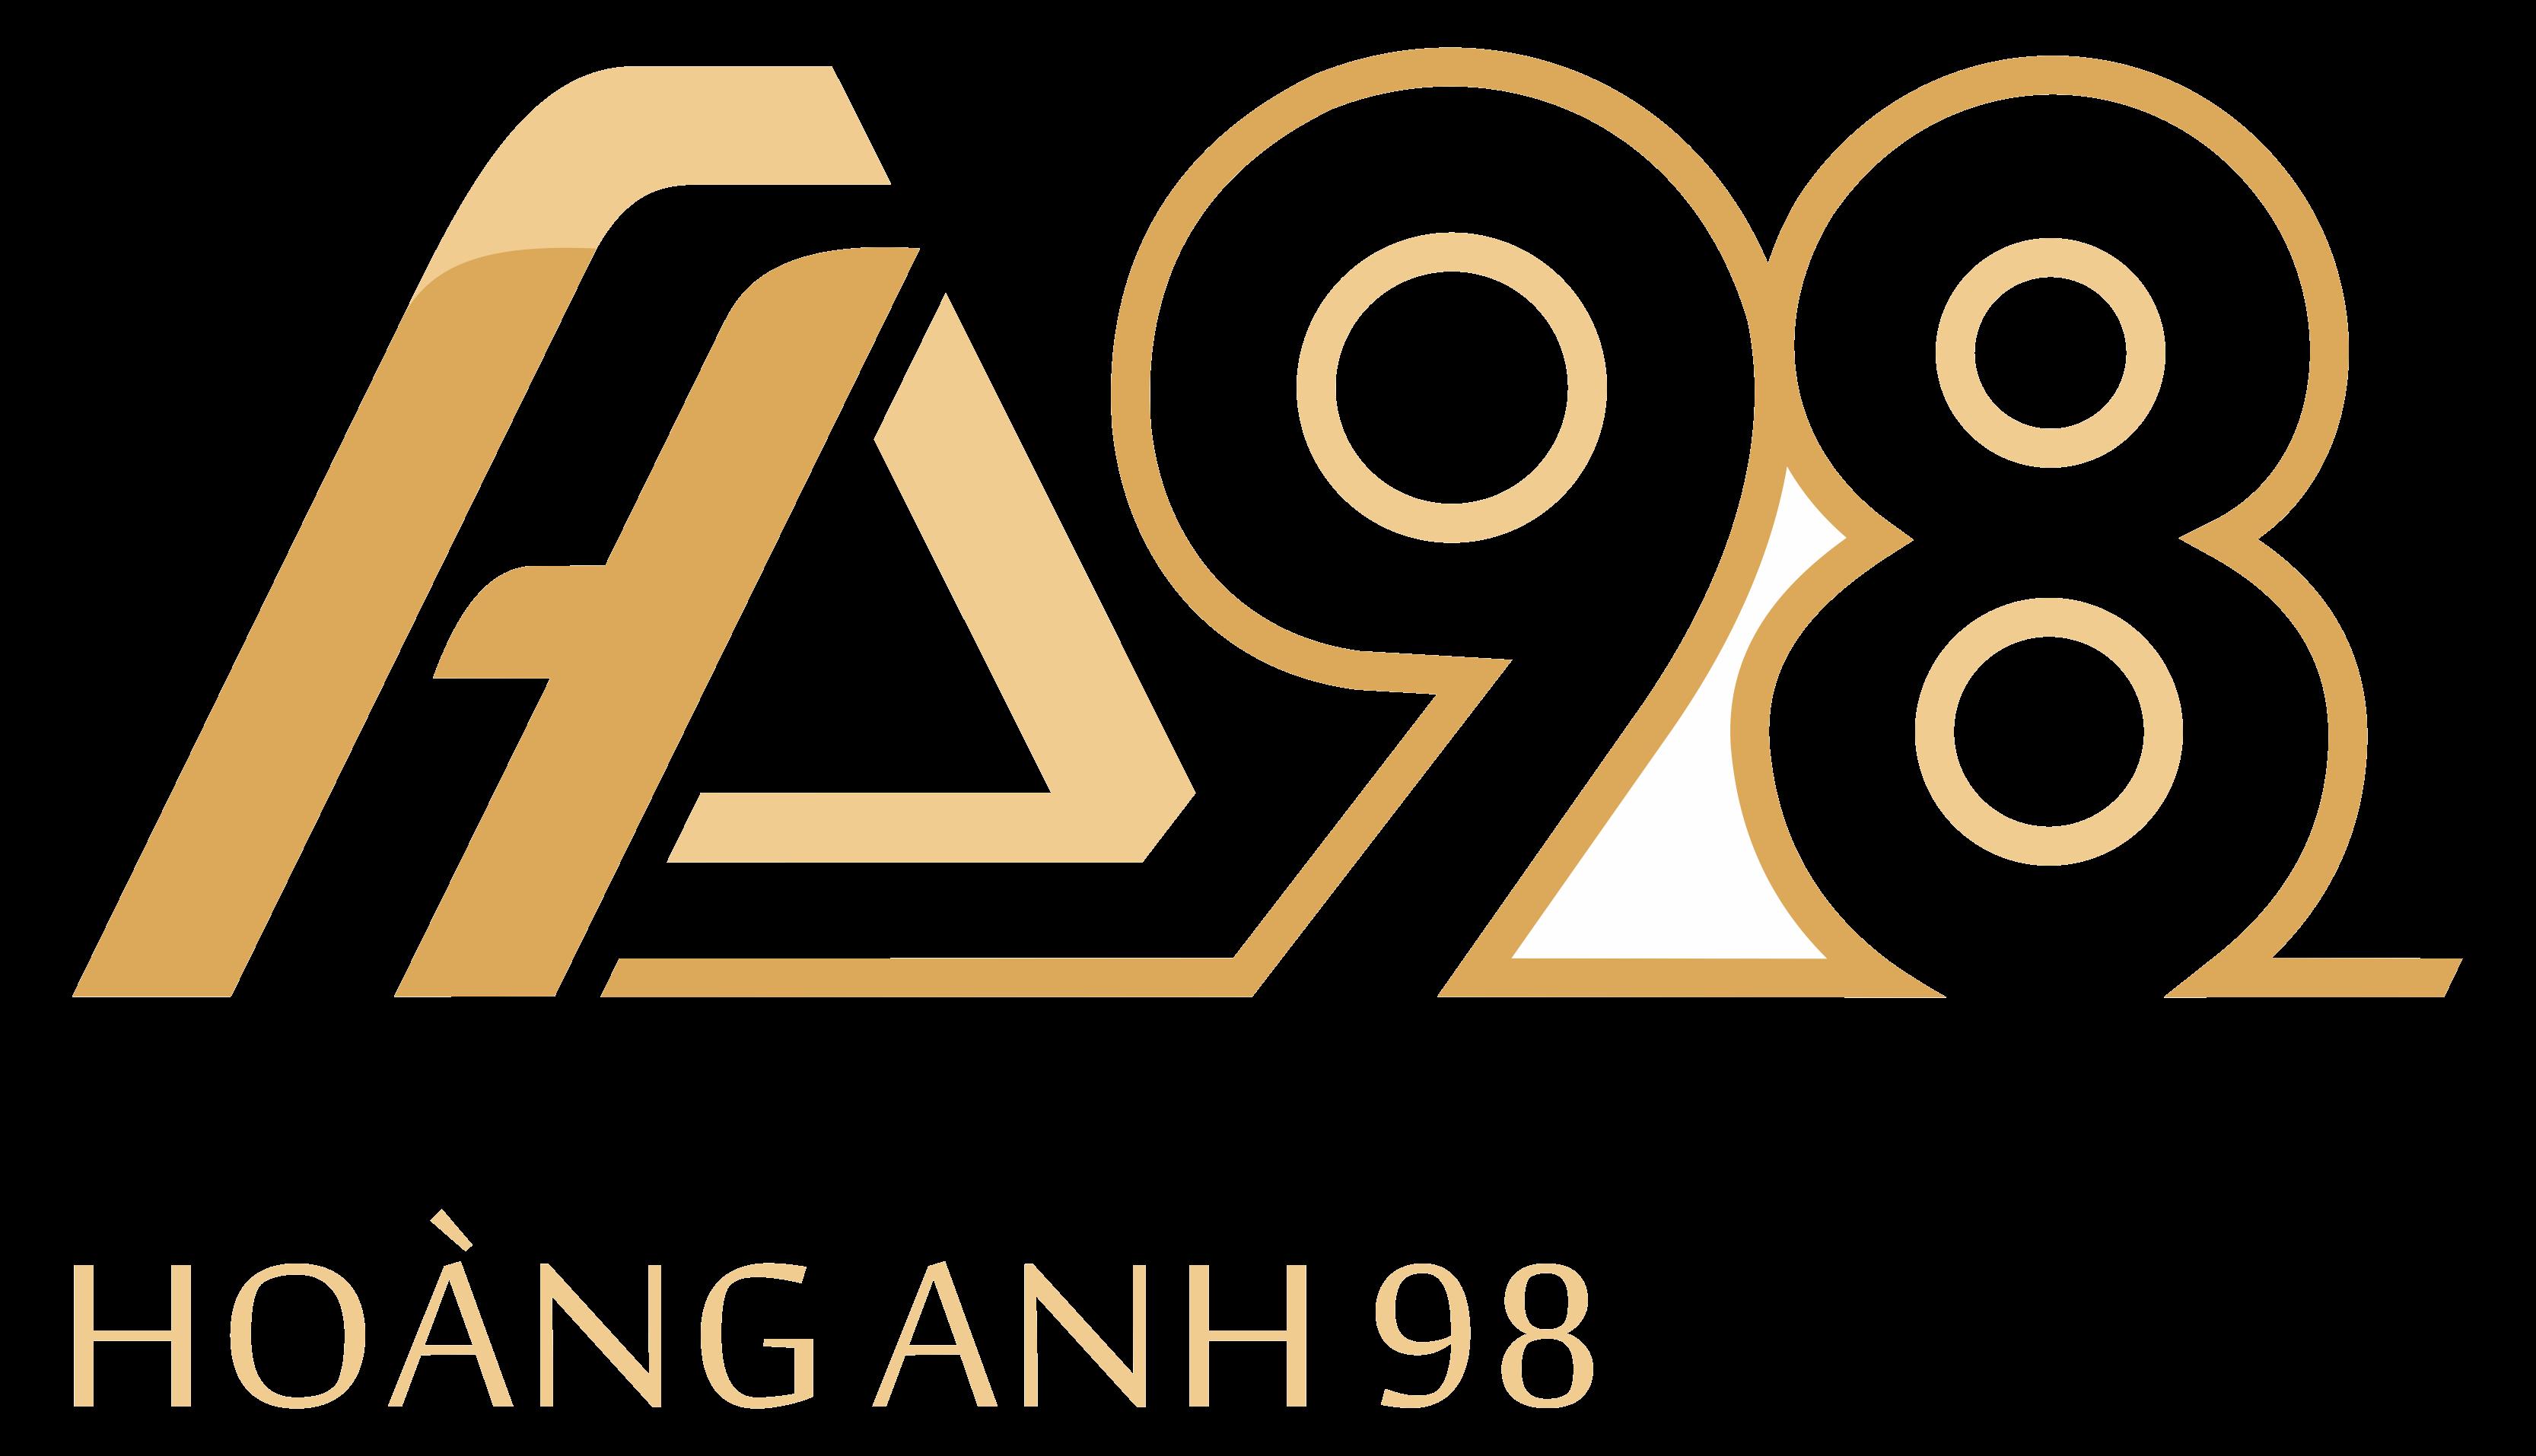 HoangAnh98